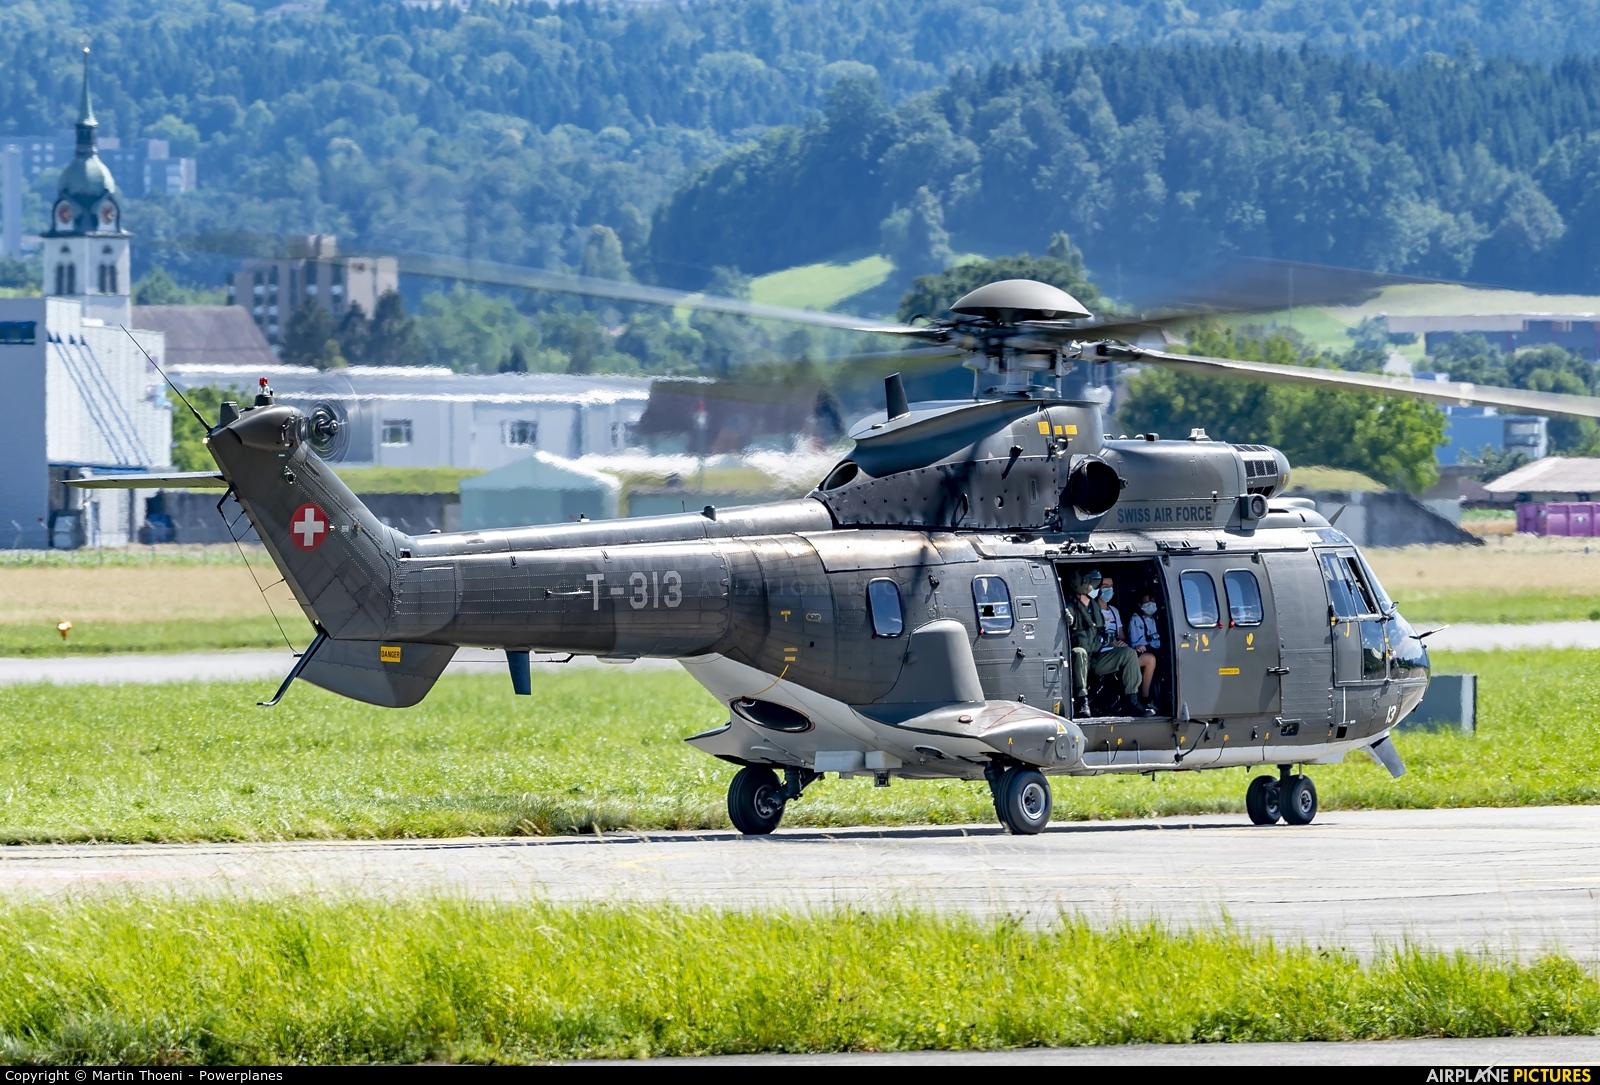 Switzerland - Air Force T-313 aircraft at Emmen